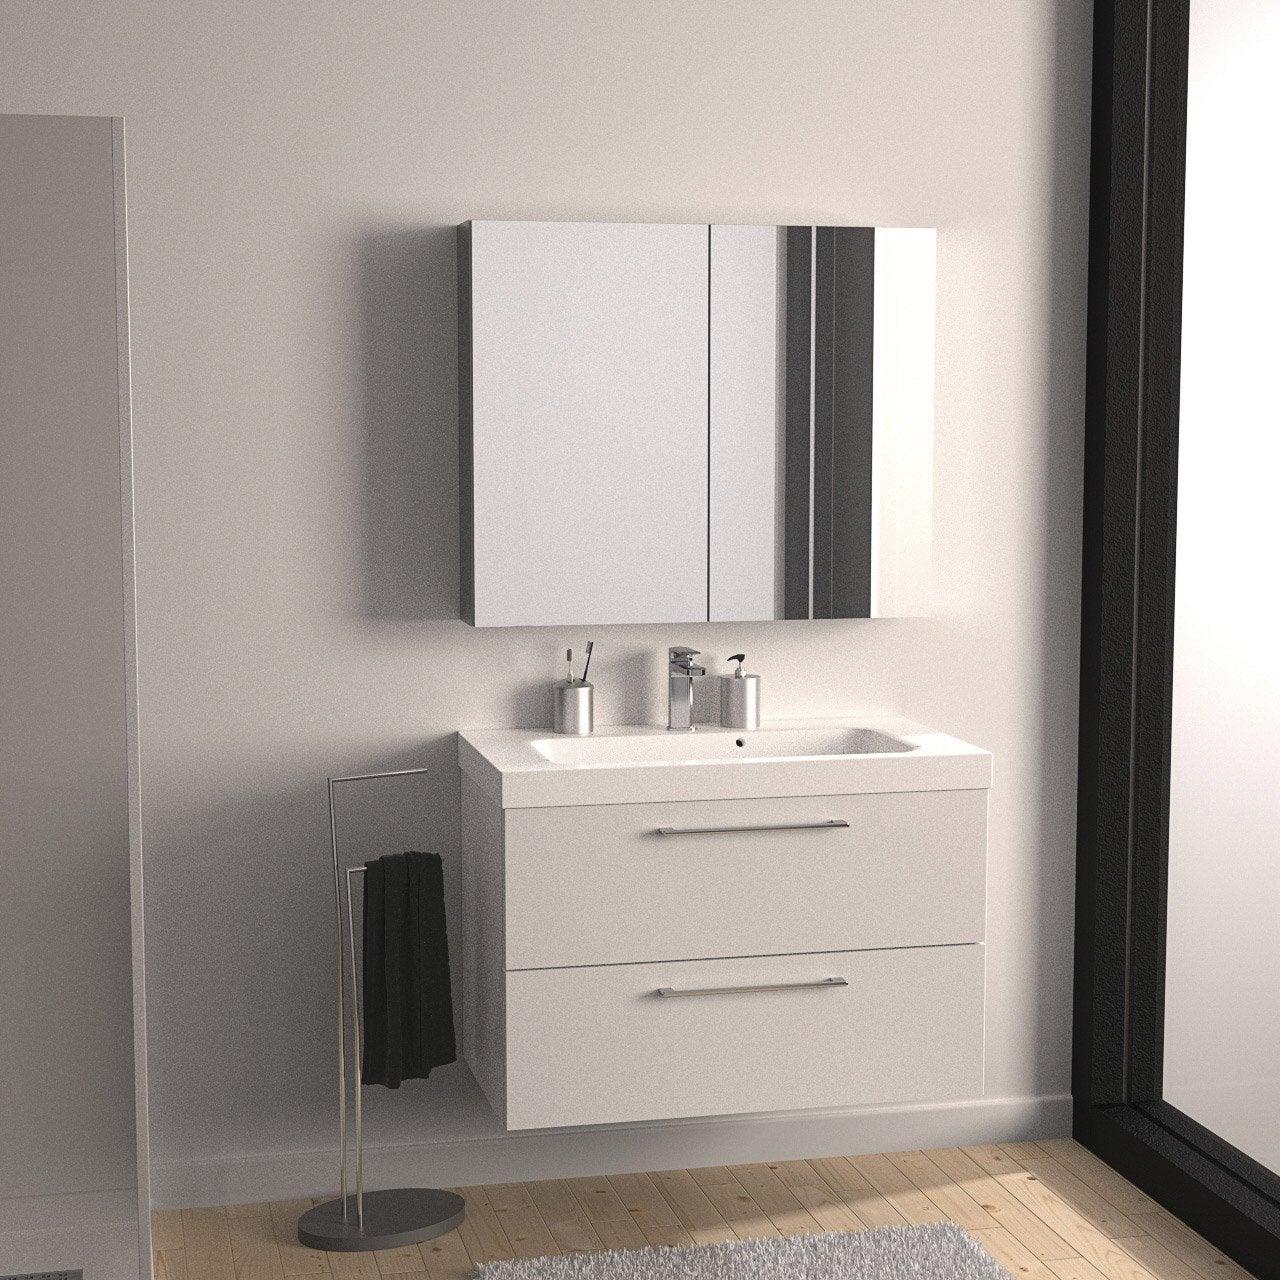 Meuble sous vasque x x cm blanc sensea remix leroy merlin - Iotti mobili bagno ...